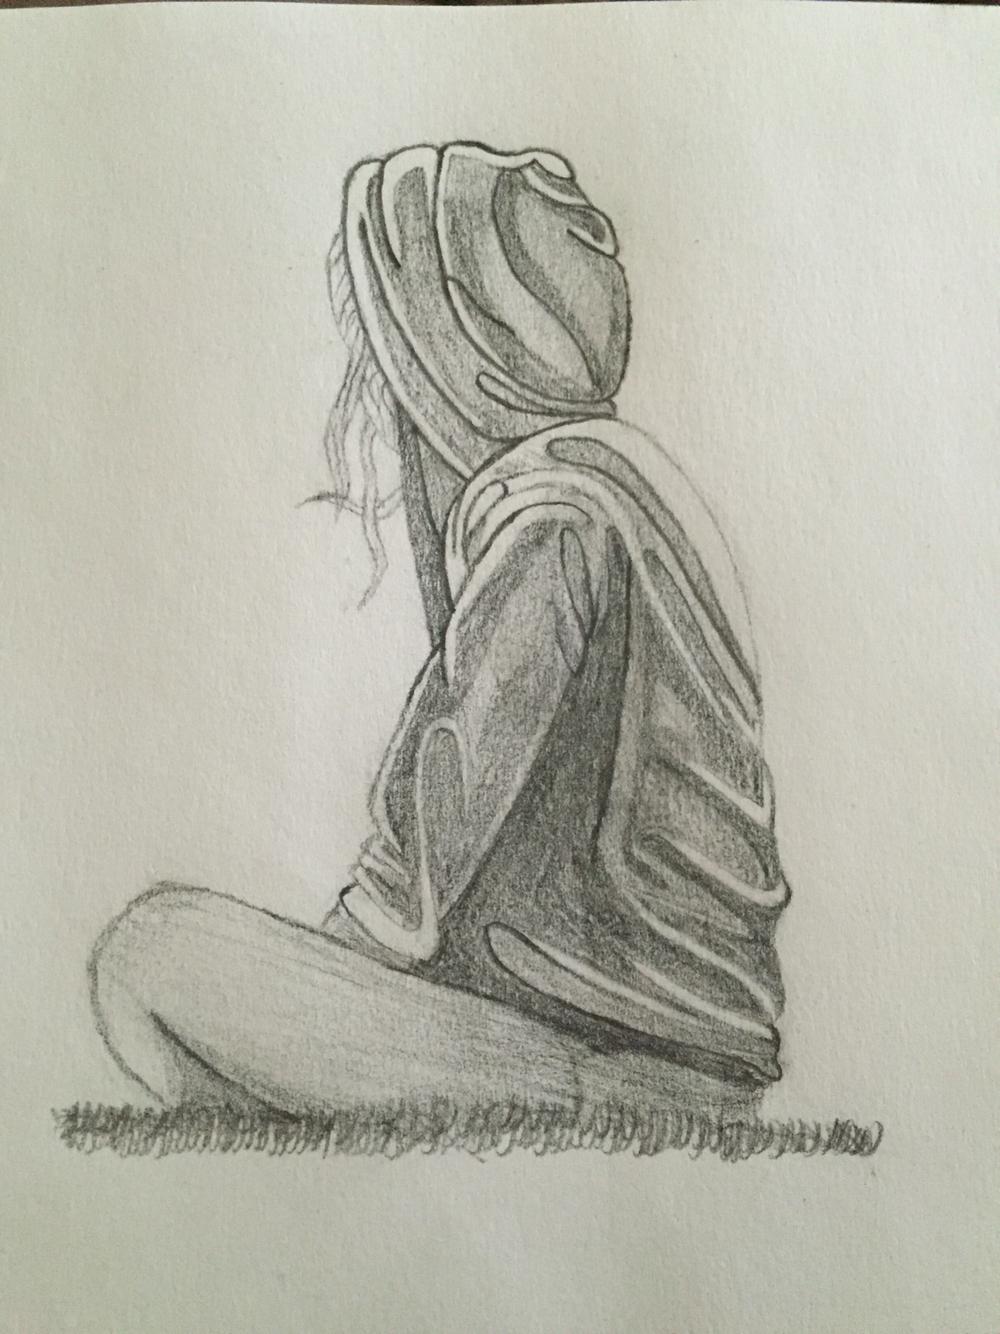 1000x1334 Sad Girl Colourful Drawing Pic Sad Girl Colourful Scatch Sad Angel